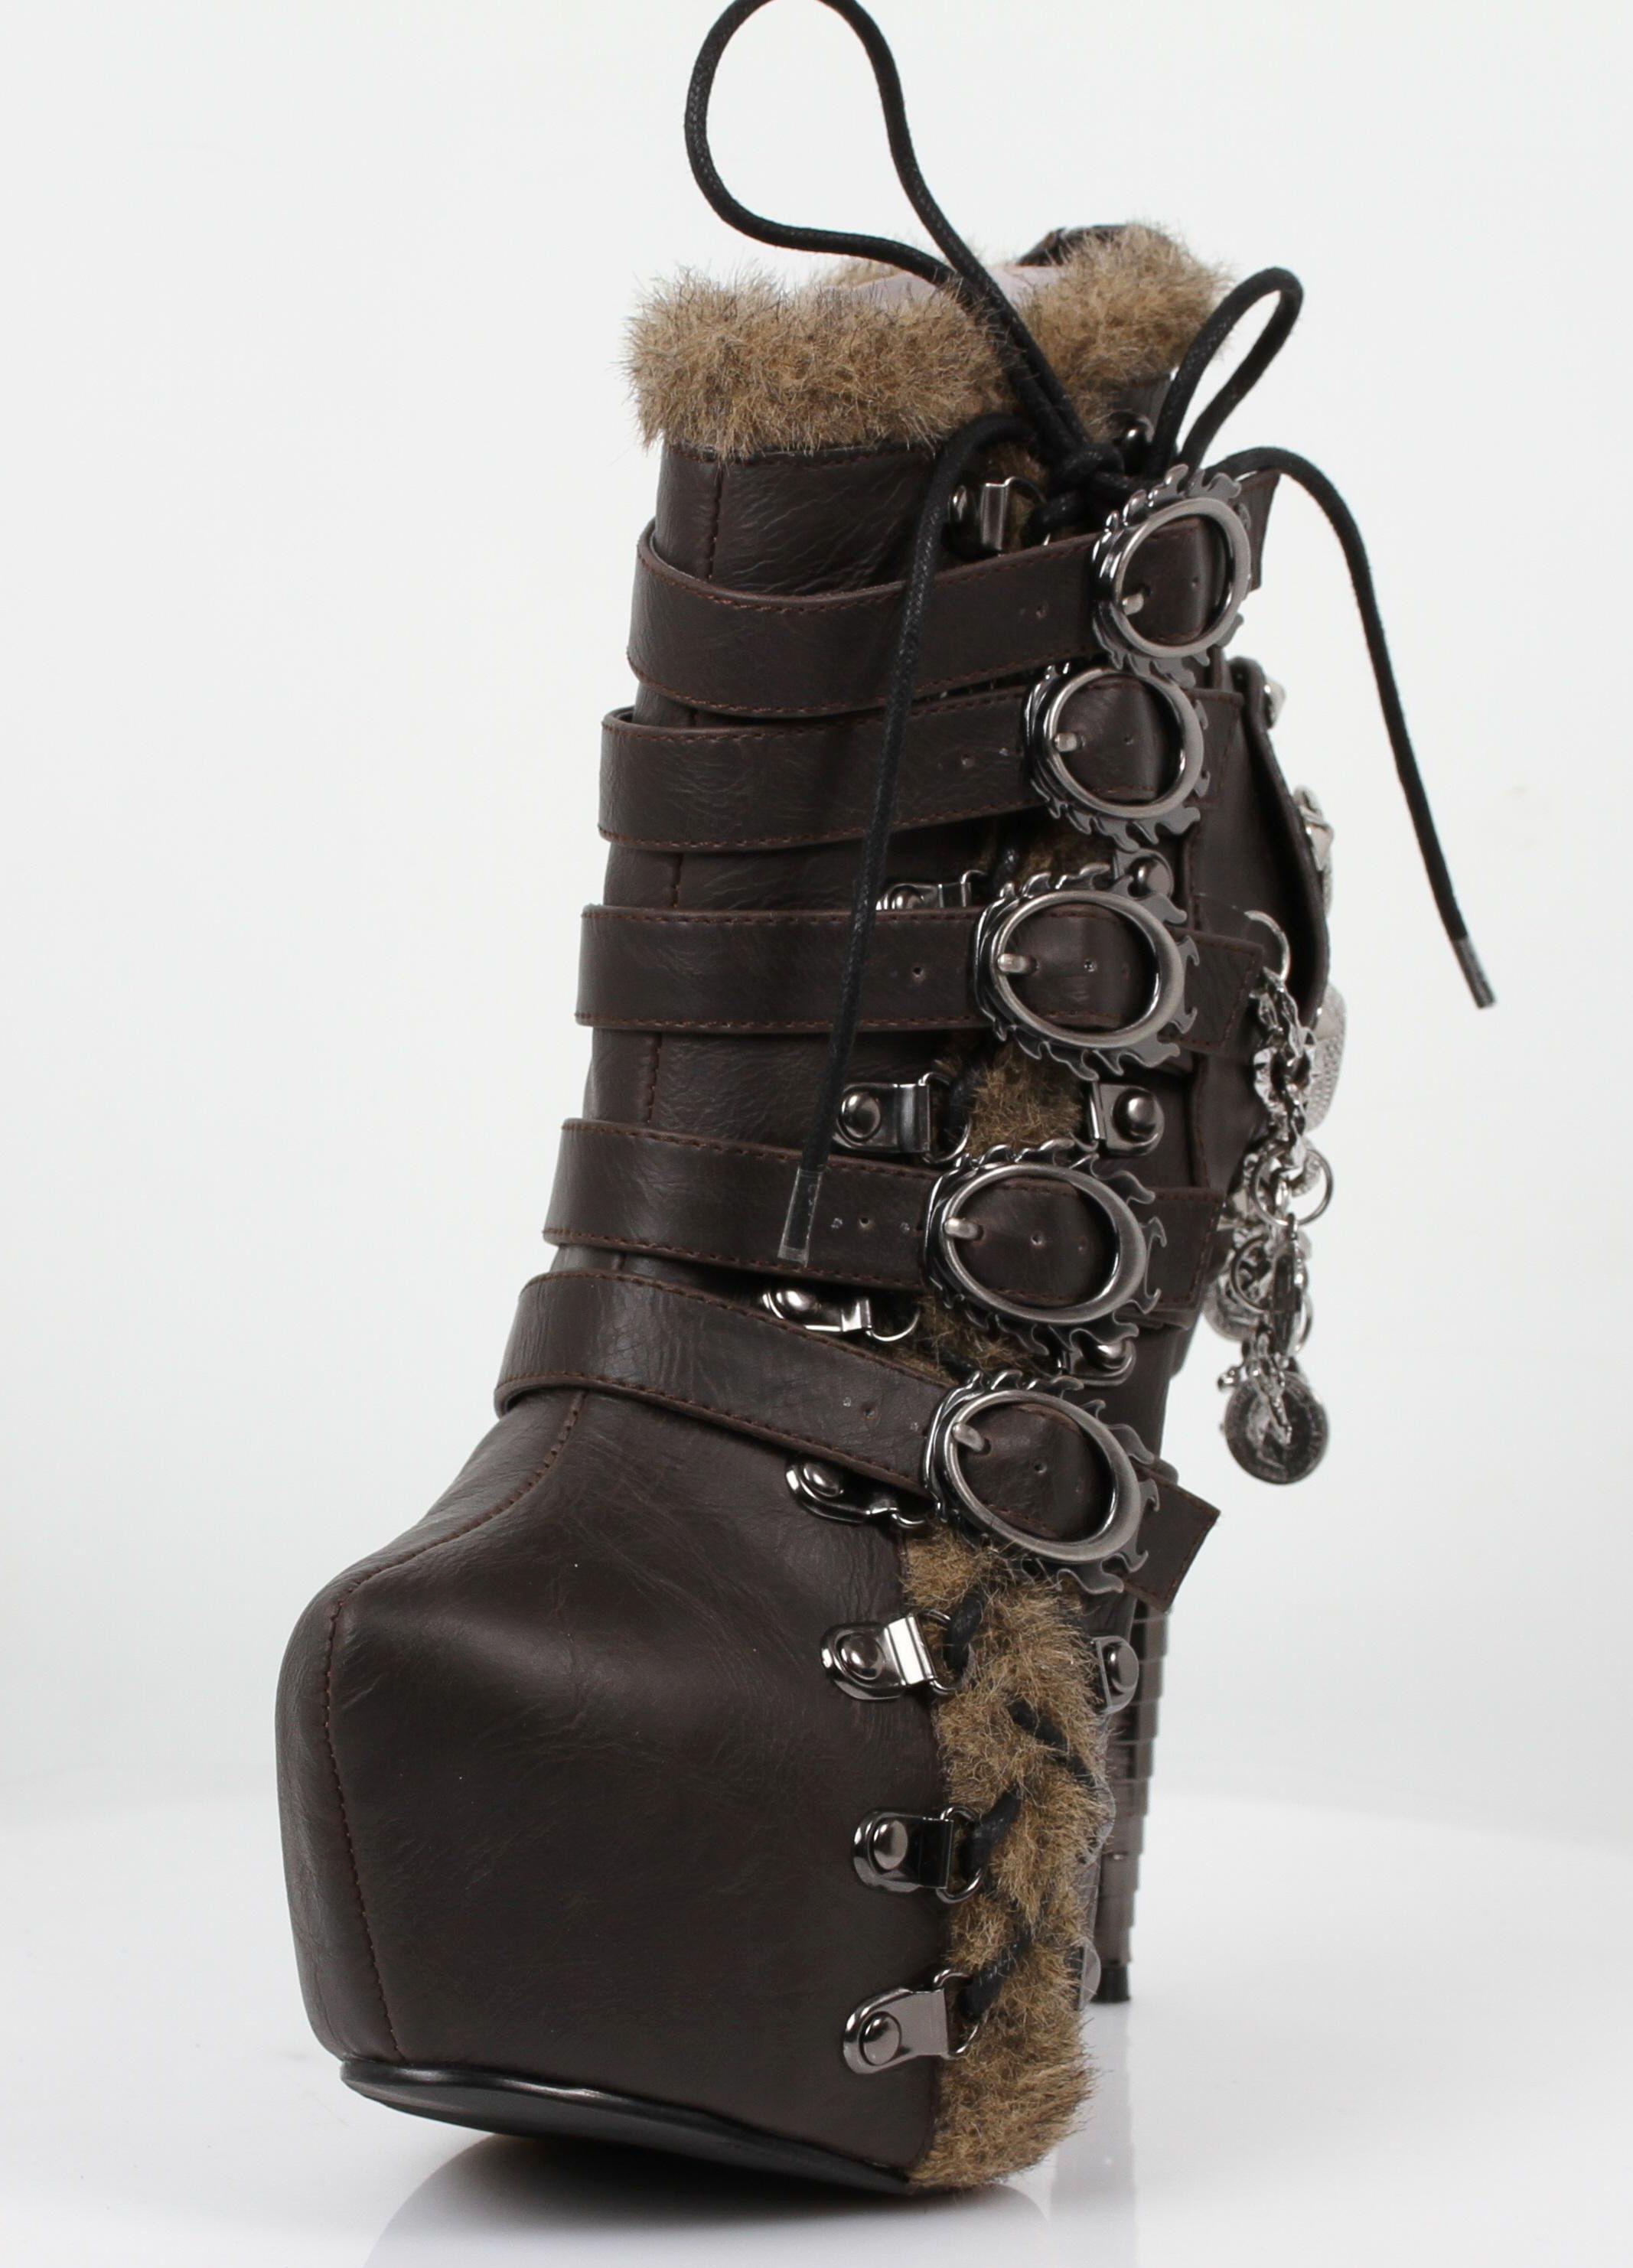 hades_shoes_adler_dark_brown_stiletto_booties_booties_3.jpg